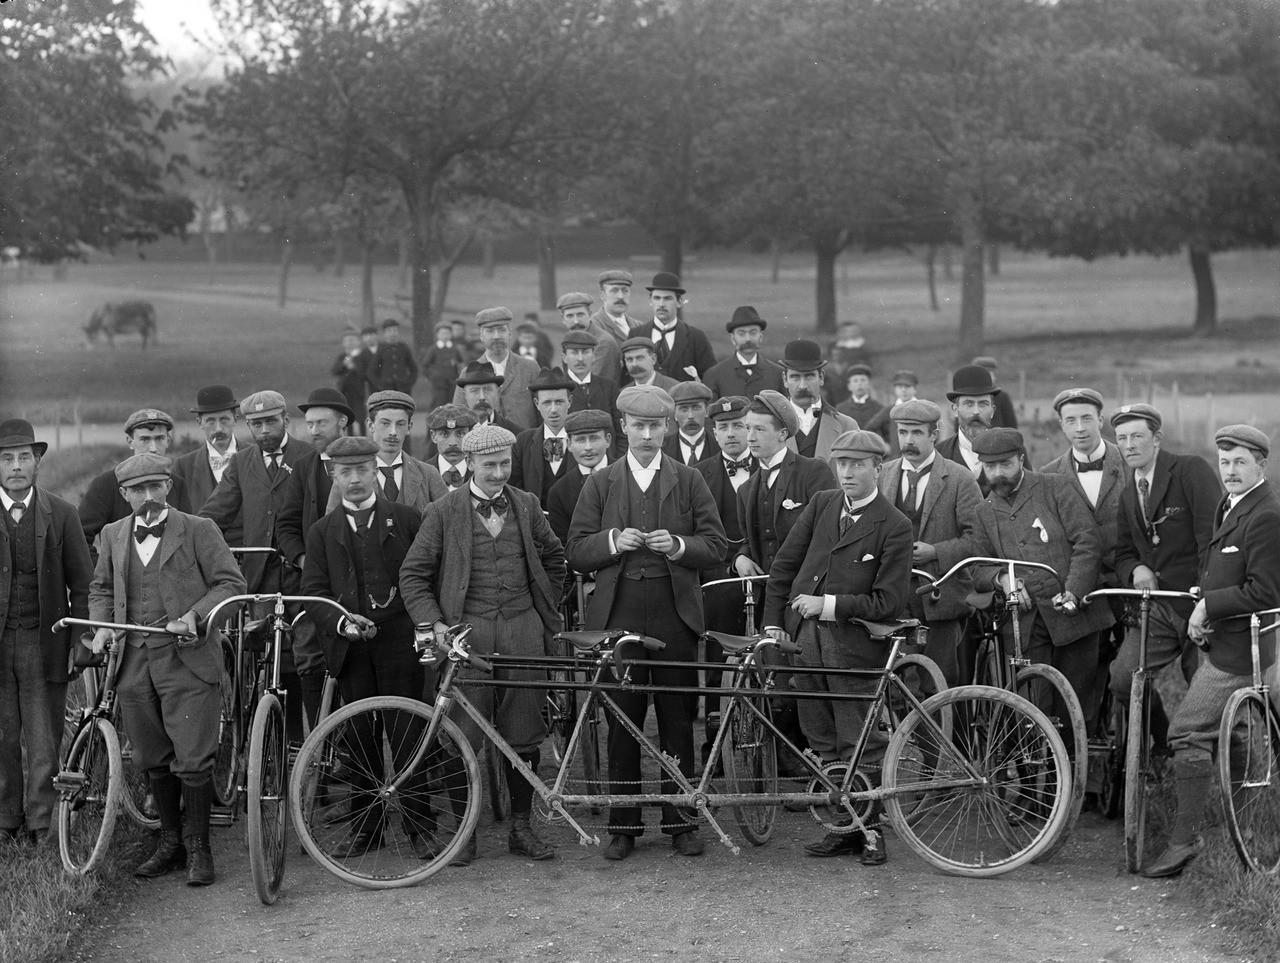 1897. Waterford biciklis klub, Írország..jpg